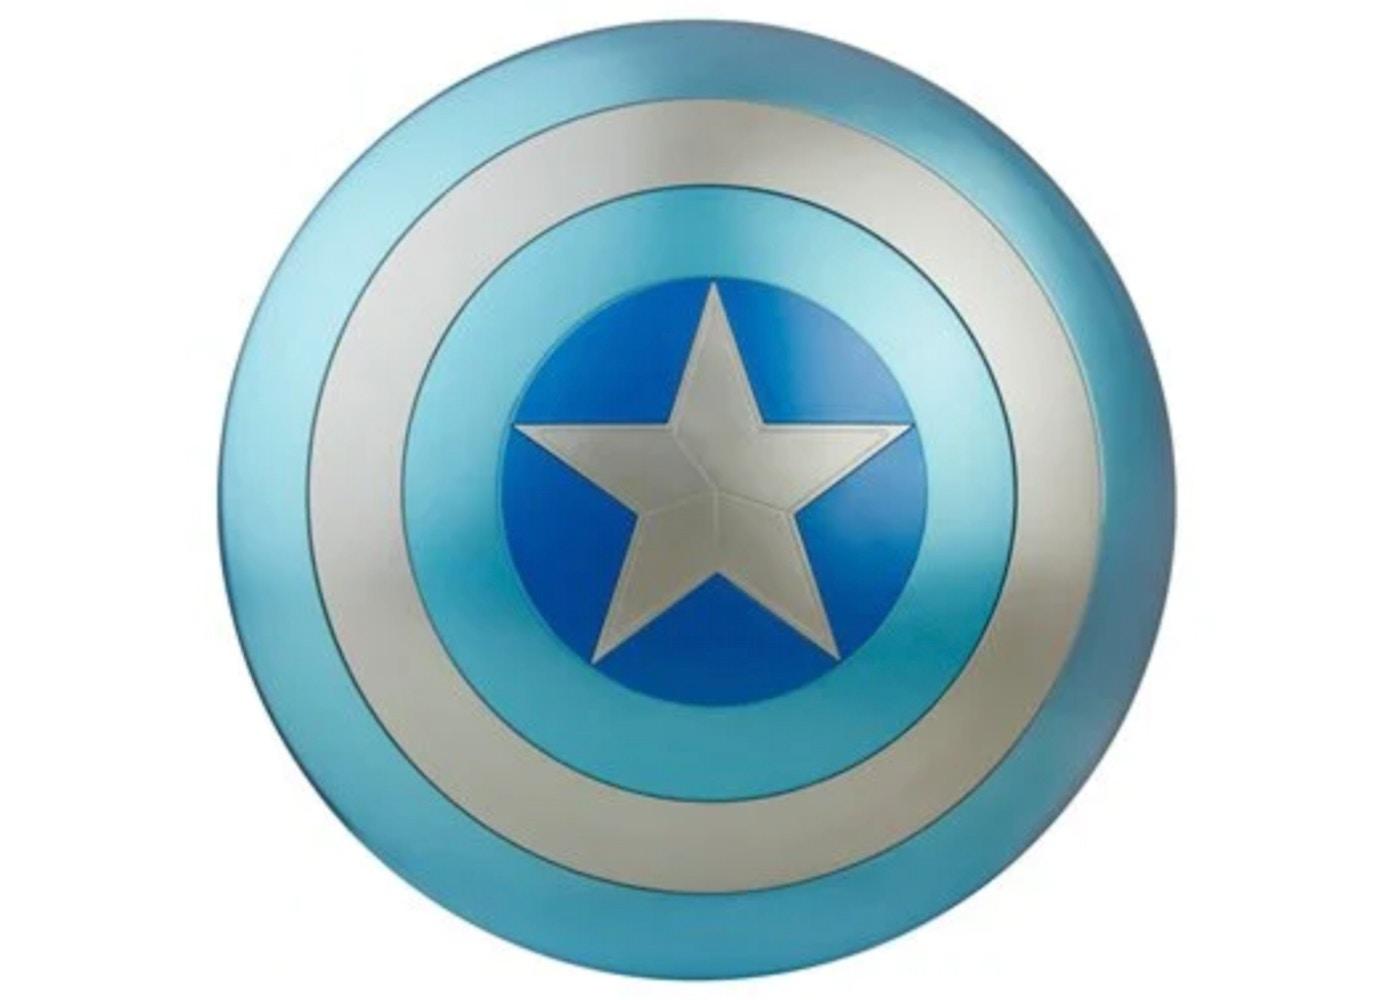 Marvel Legends Captain America The Winter Solider Stealth Shield ...